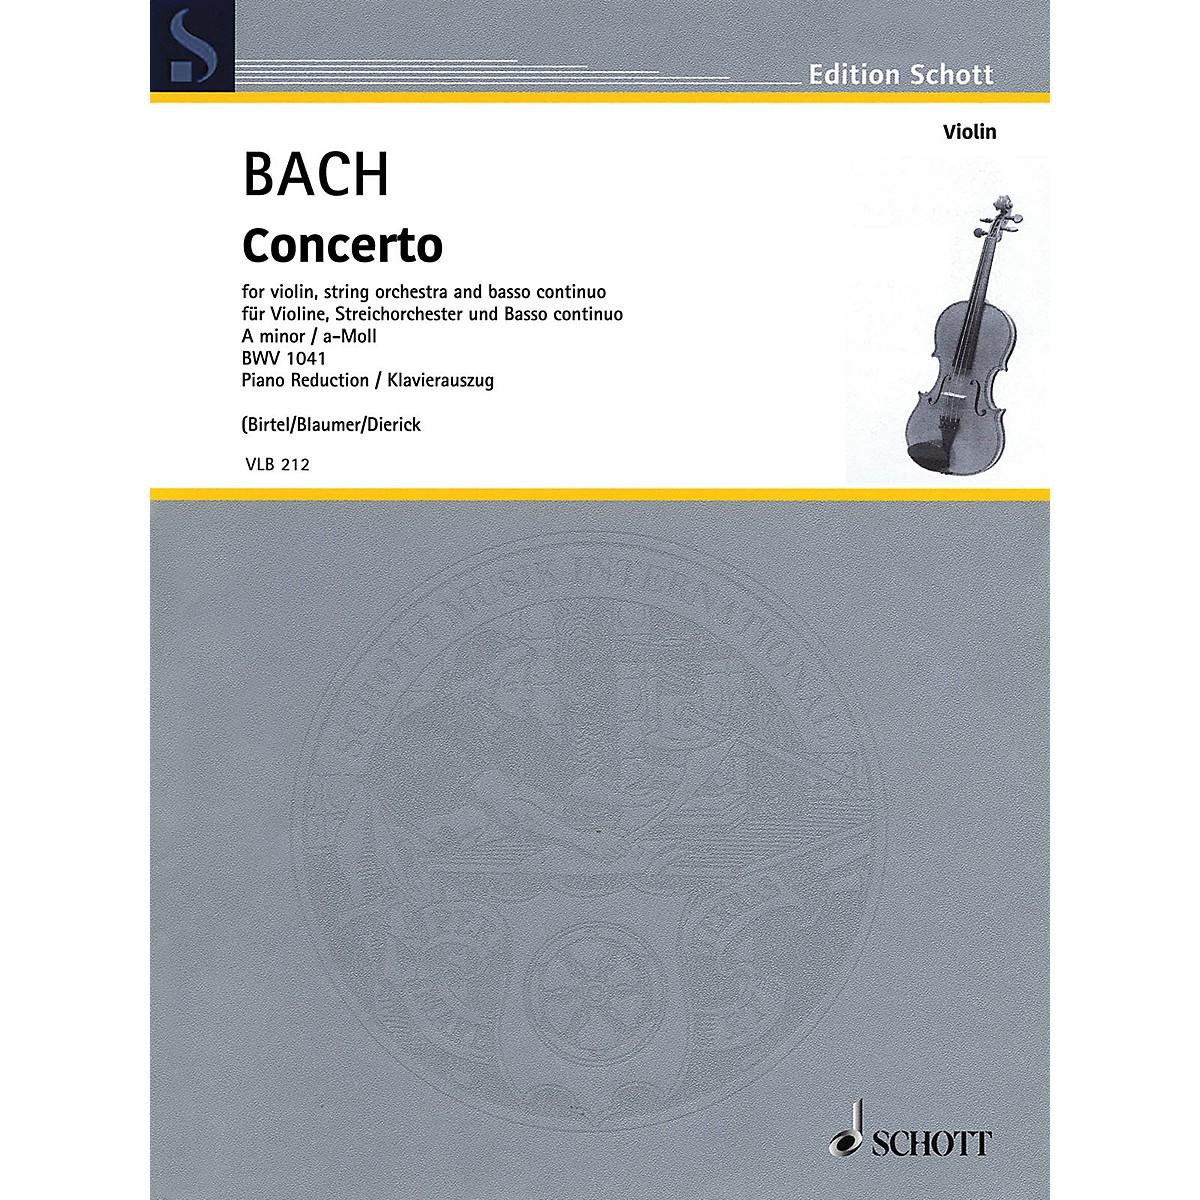 Schott Concerto in A Minor BWV1041 Violin and Piano Reduction - String Solo